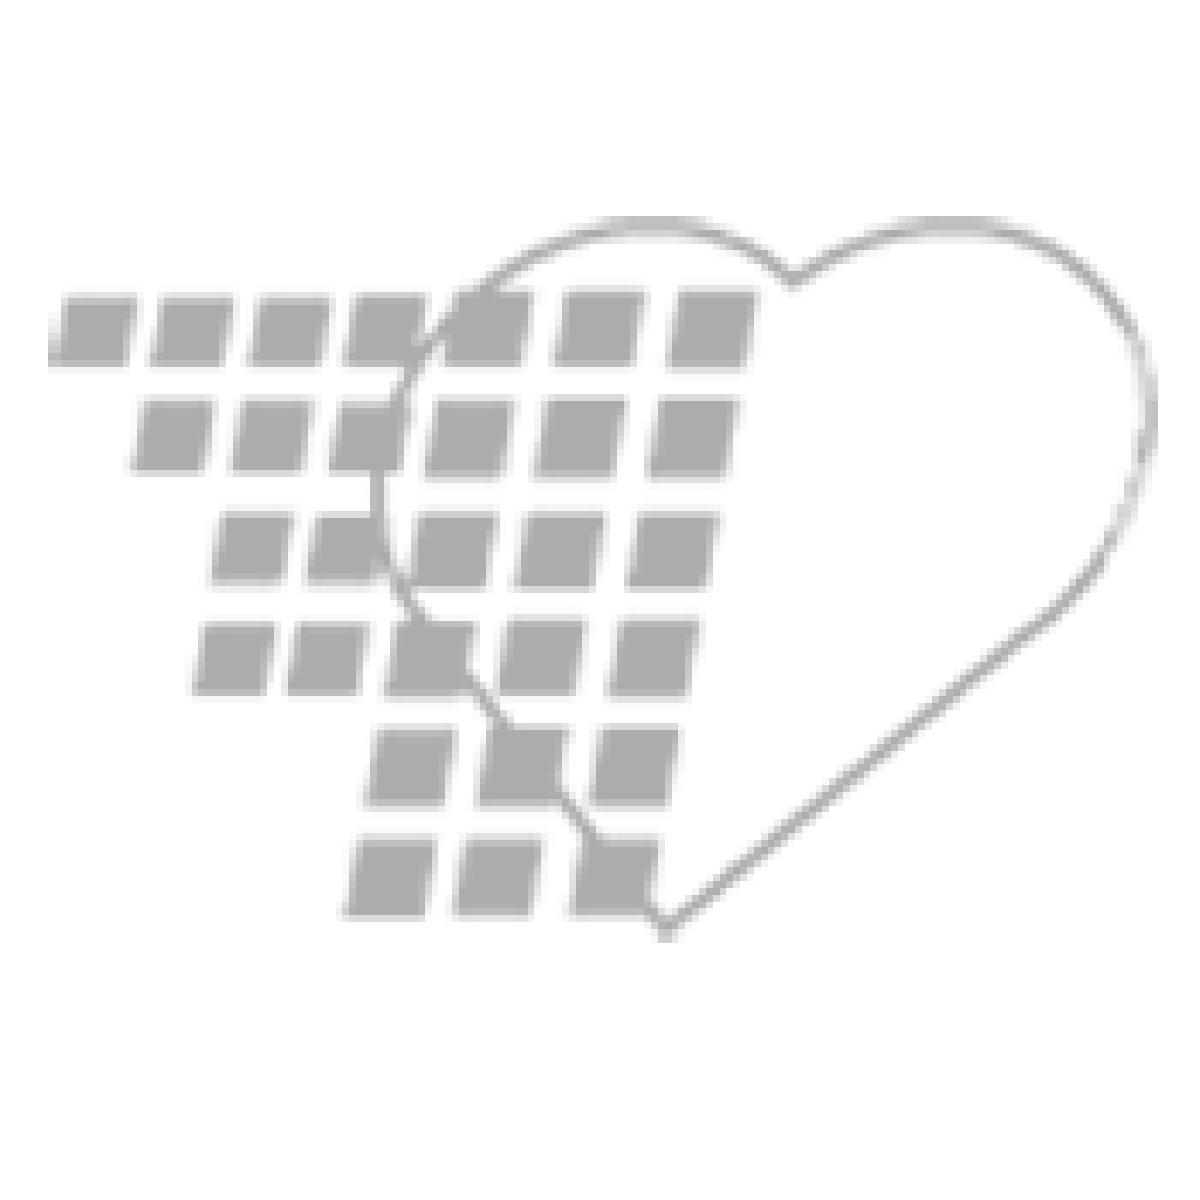 "05-51-7561 Telfa™ Non-Adhesive Island Dressing - 2"" x 3"" - Sterile"